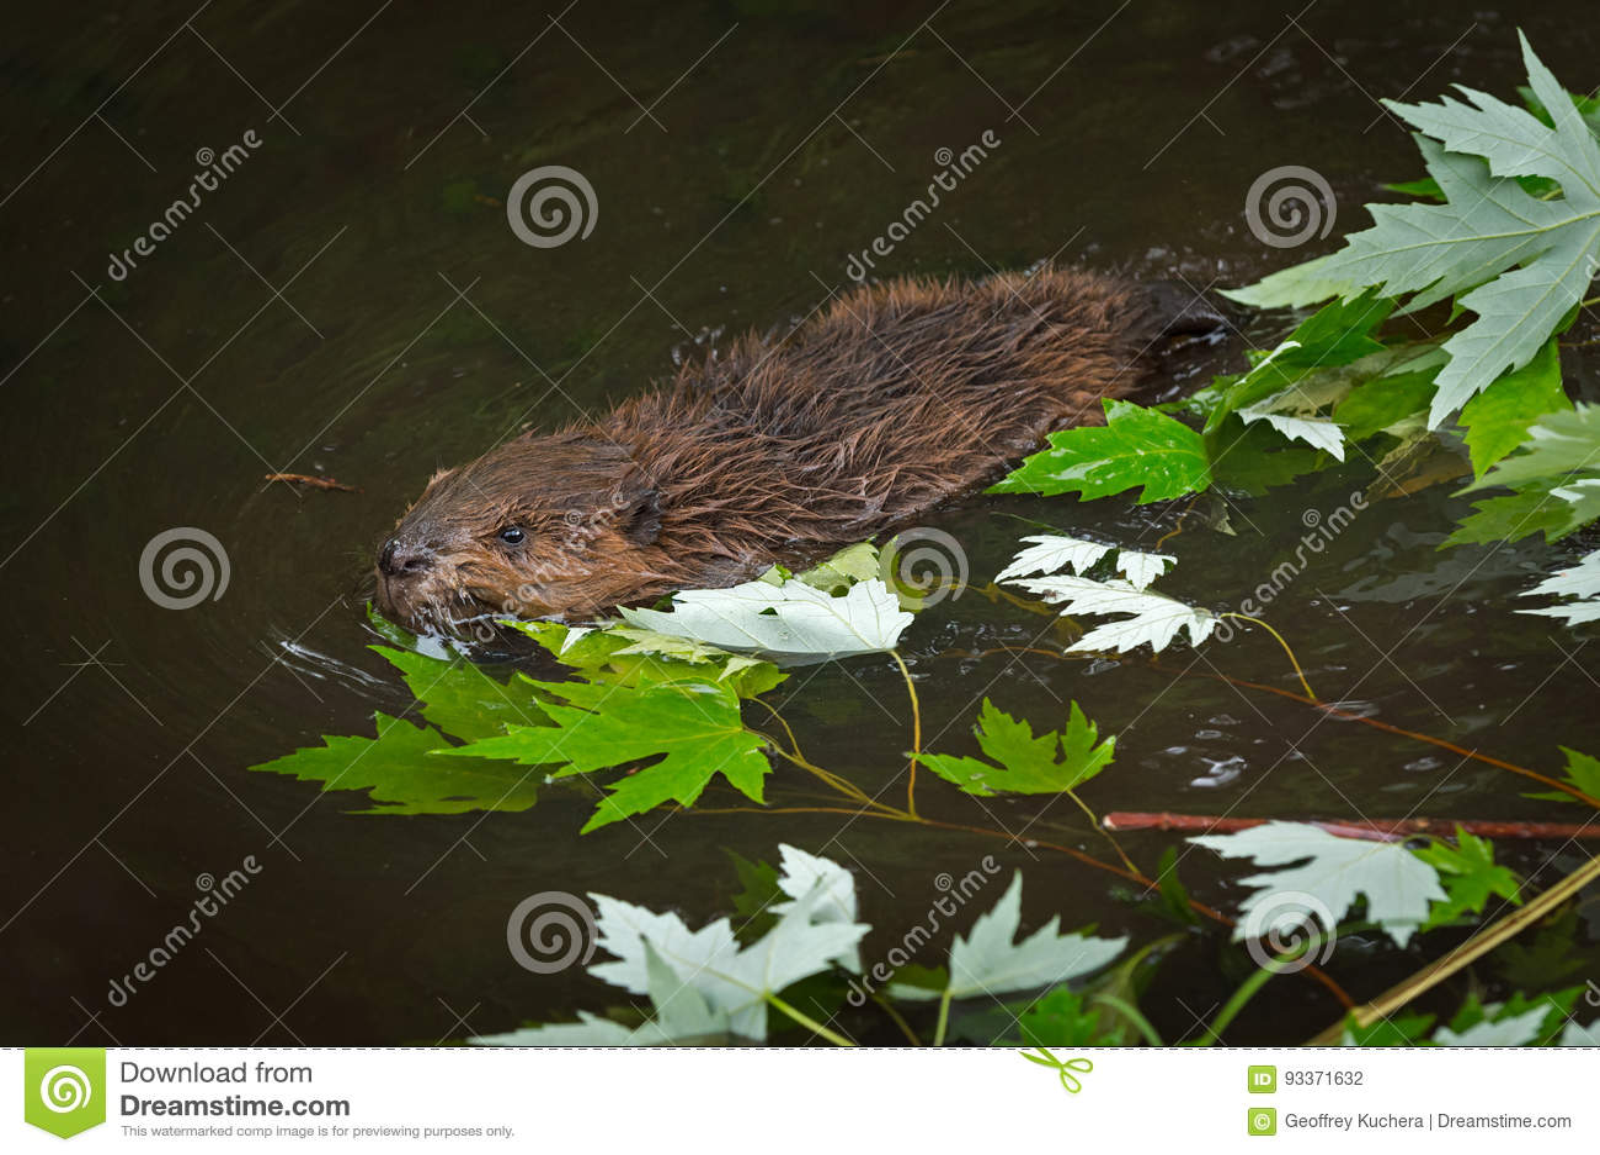 Canadensis norte-americano Kit Swims Past Leaves do rodízio do castor